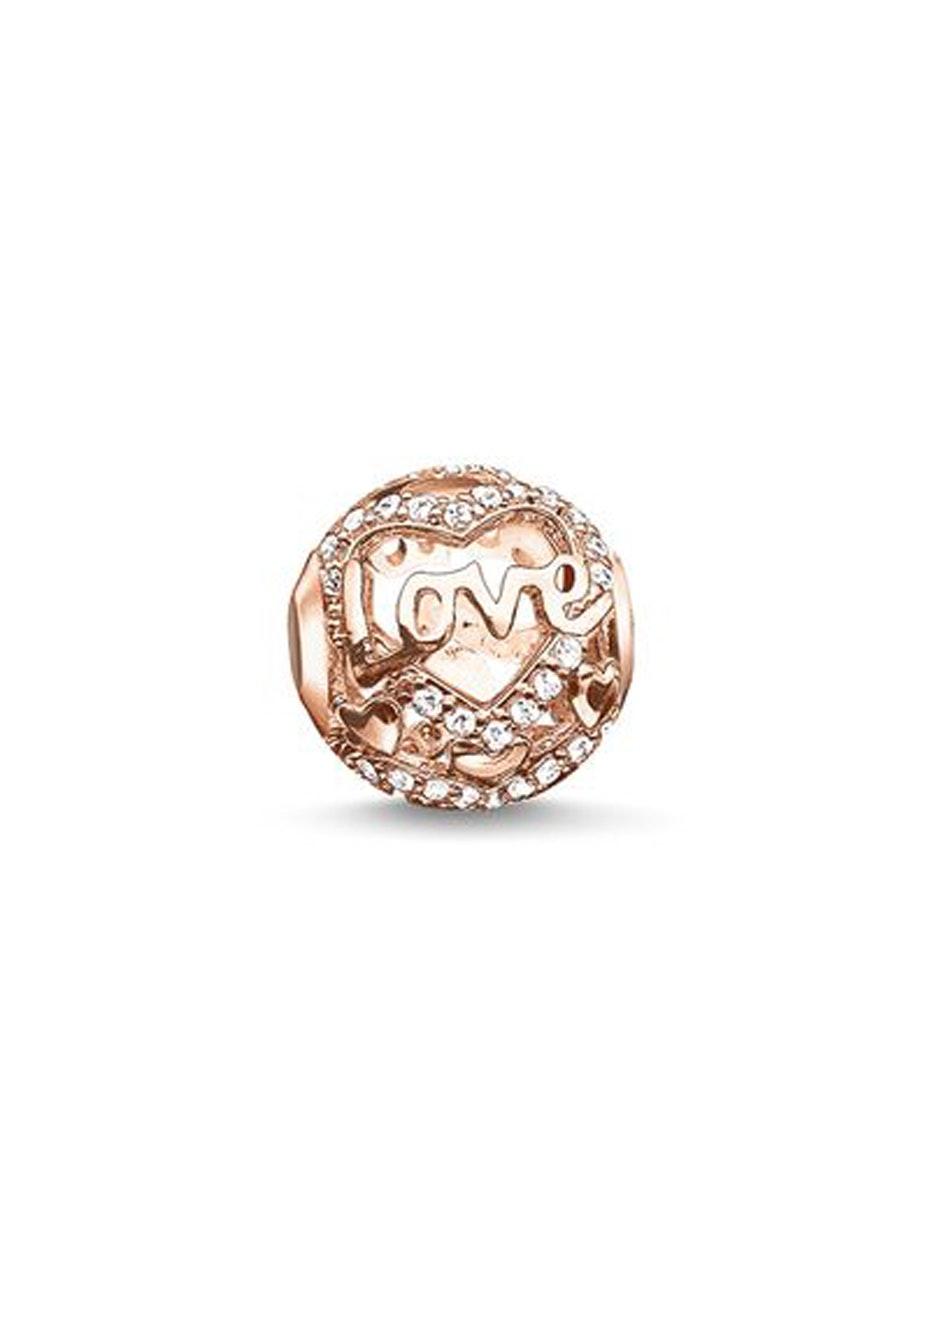 Thomas Sabo  - Karma Bead - Love Cz Rose Gold Plated